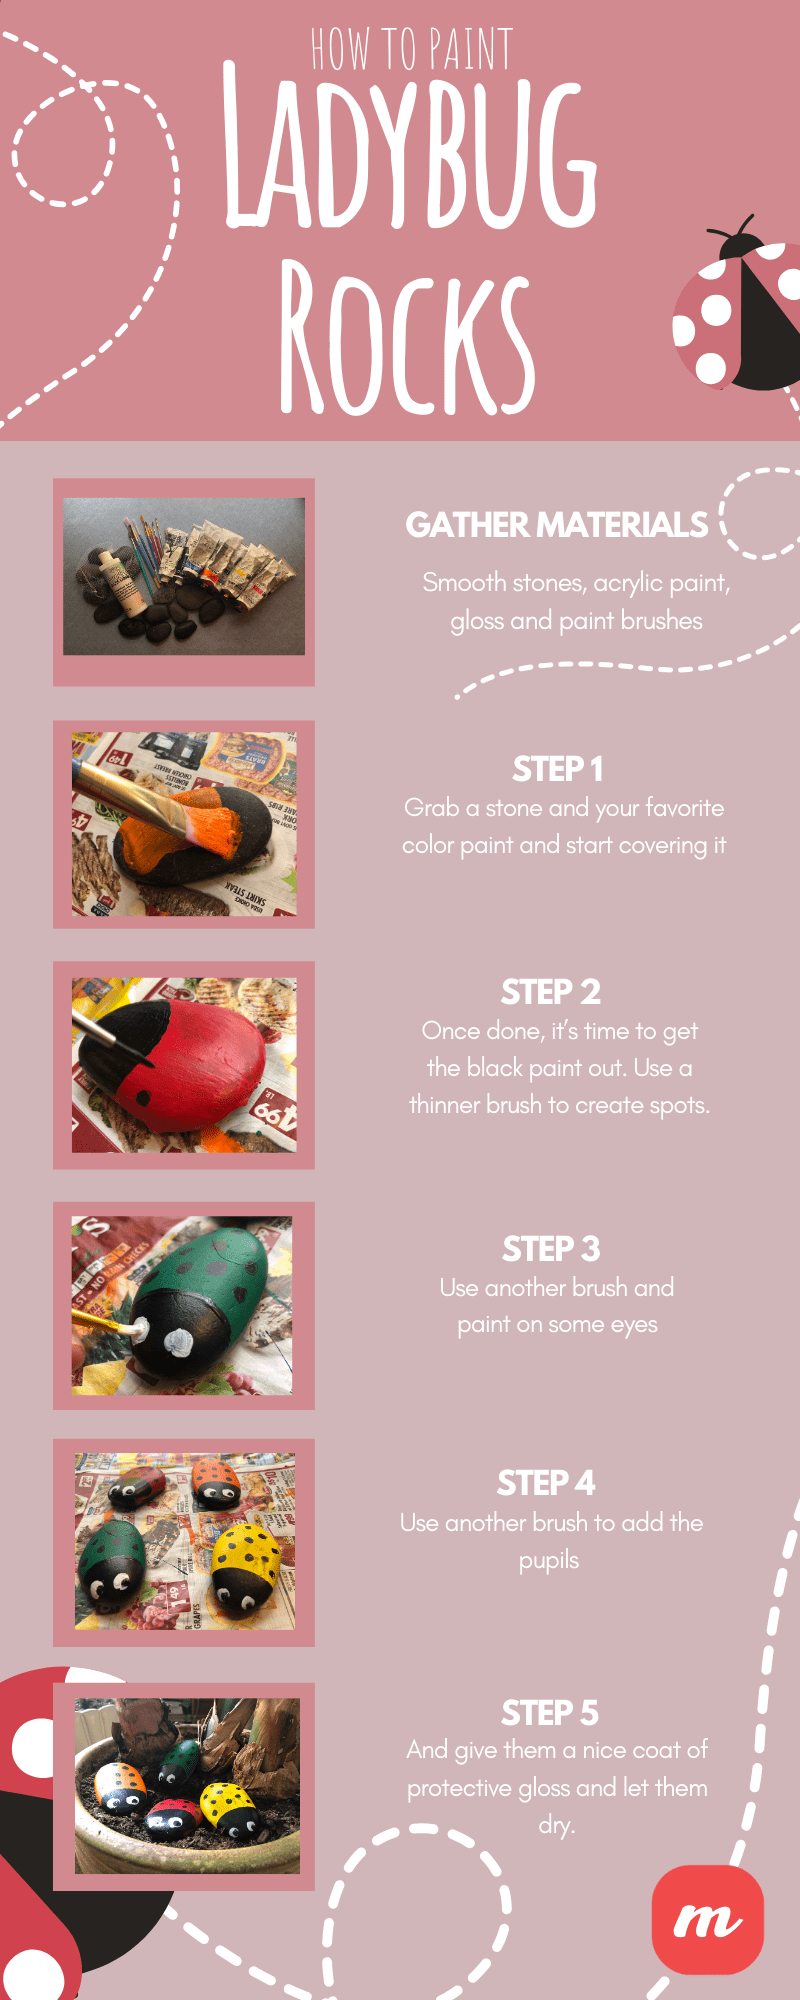 How To Paint Ladybug Rocks - Infographic